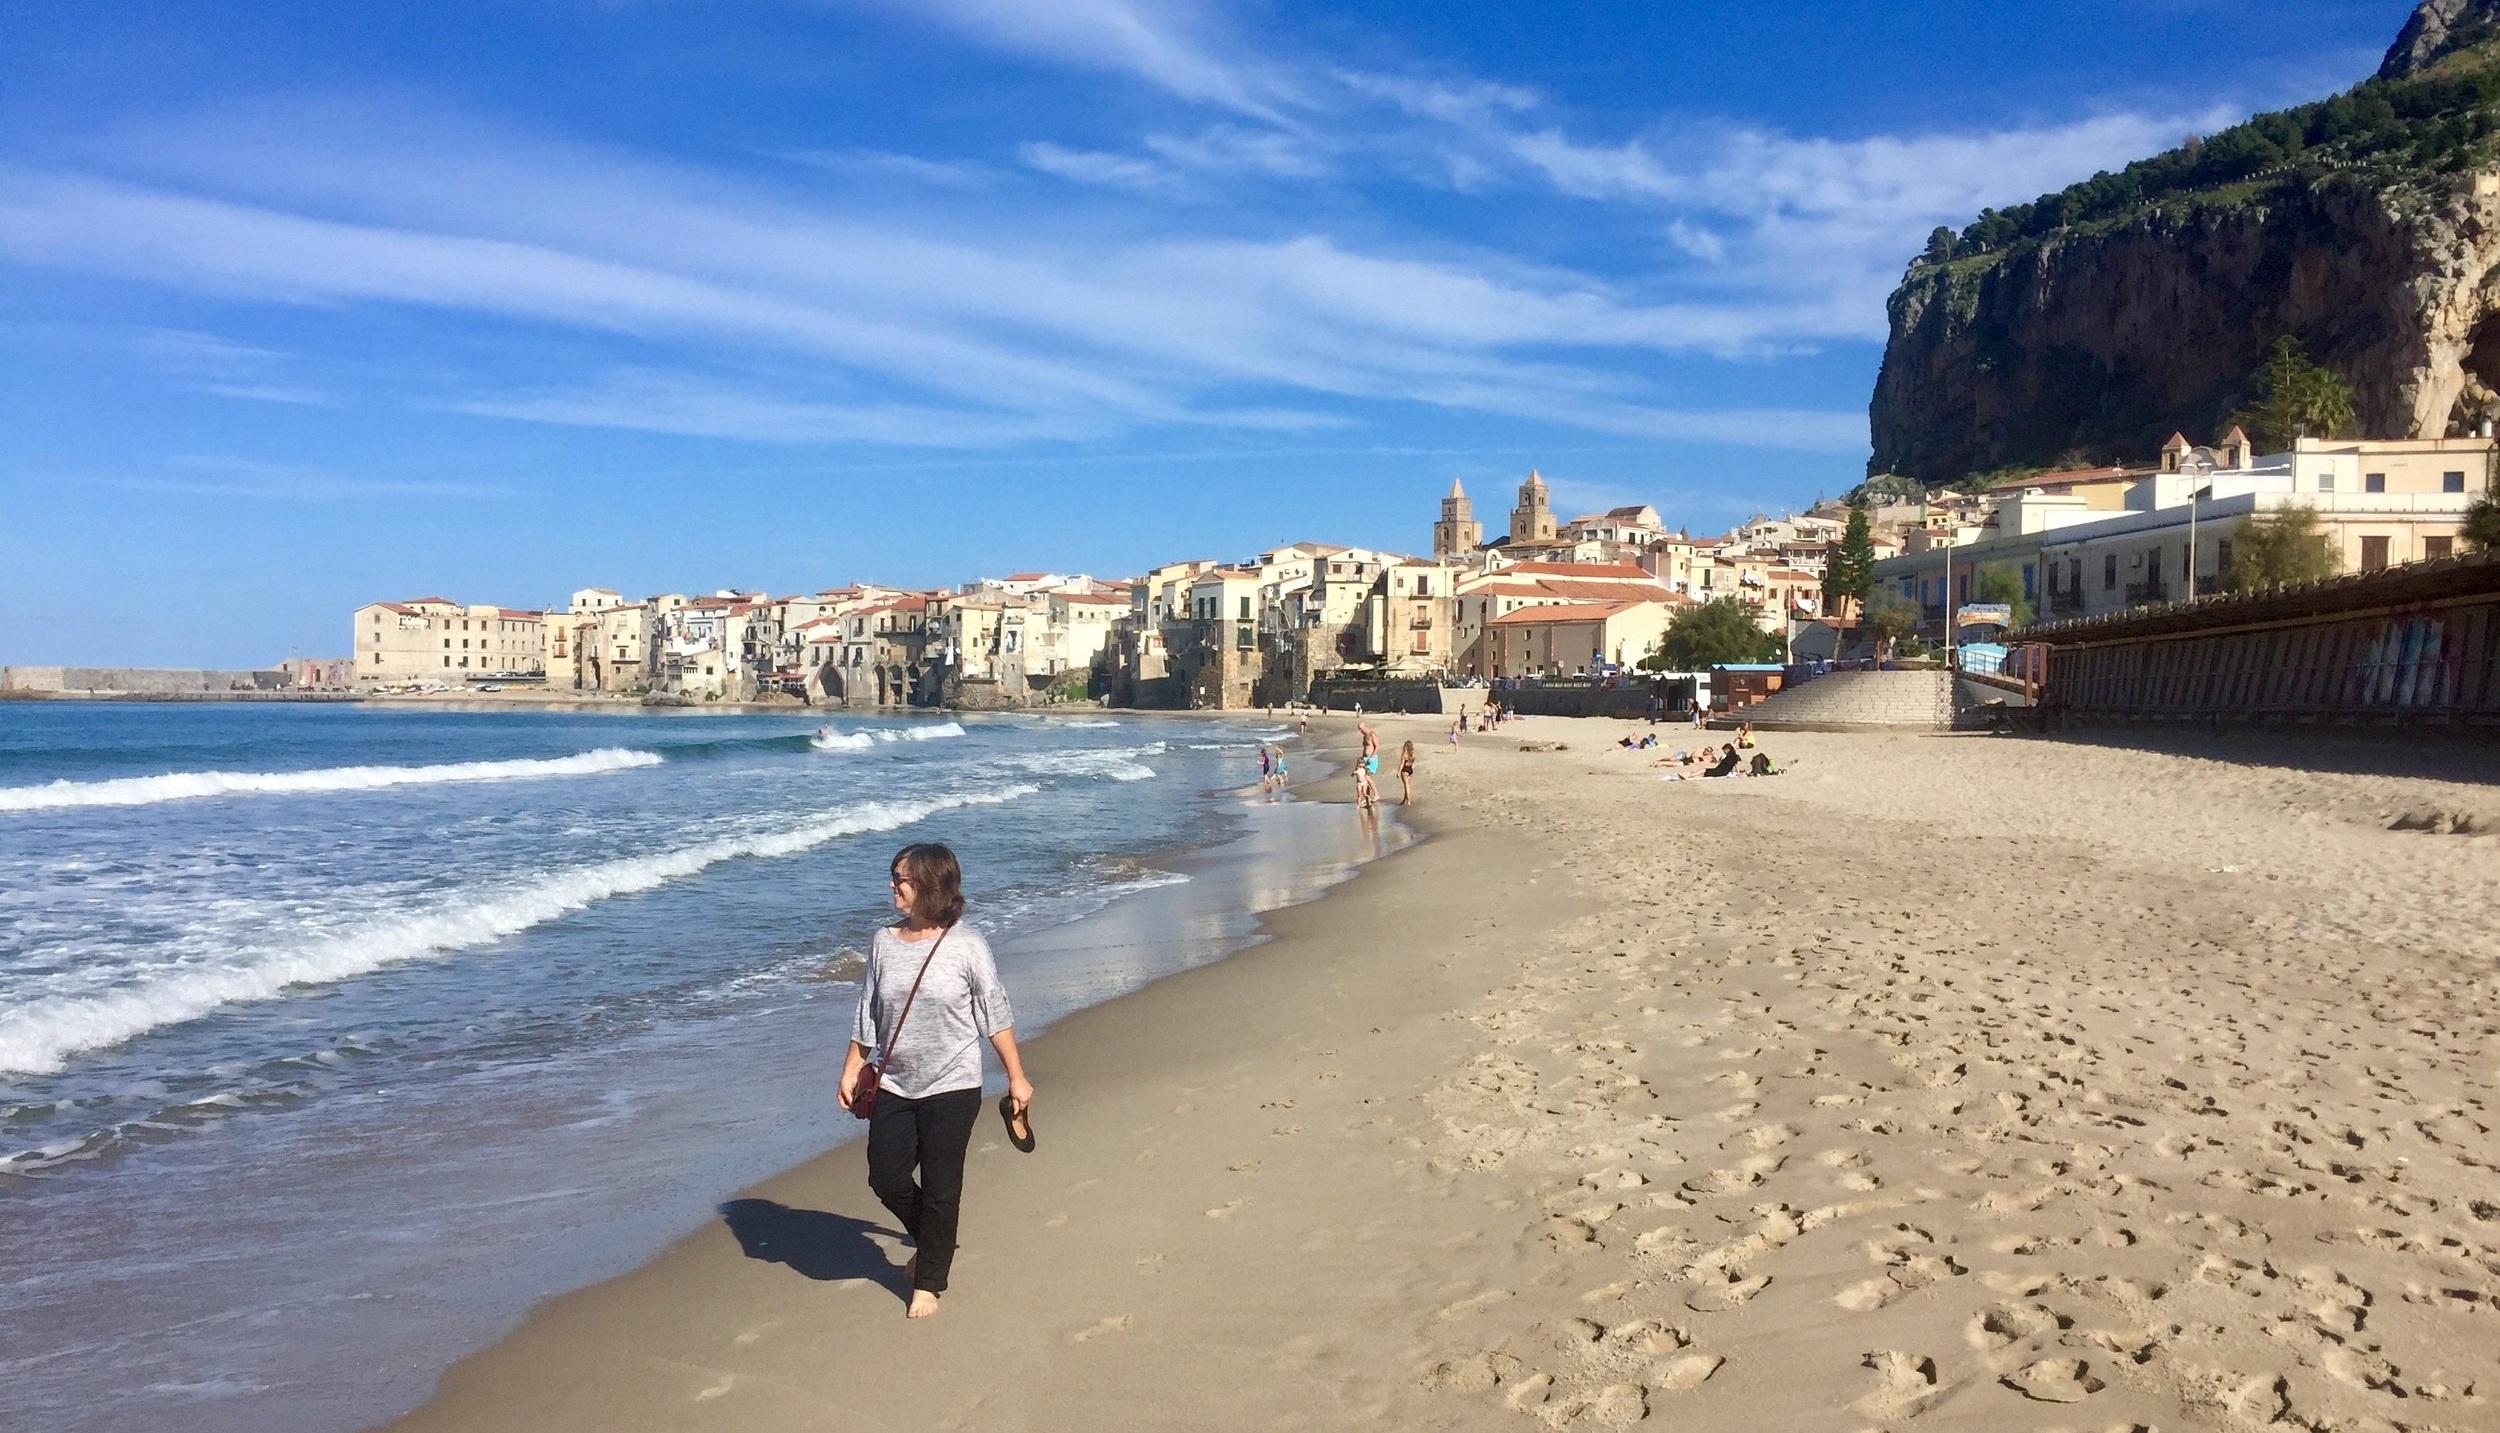 Walking the beach at Cefalu, Sicily